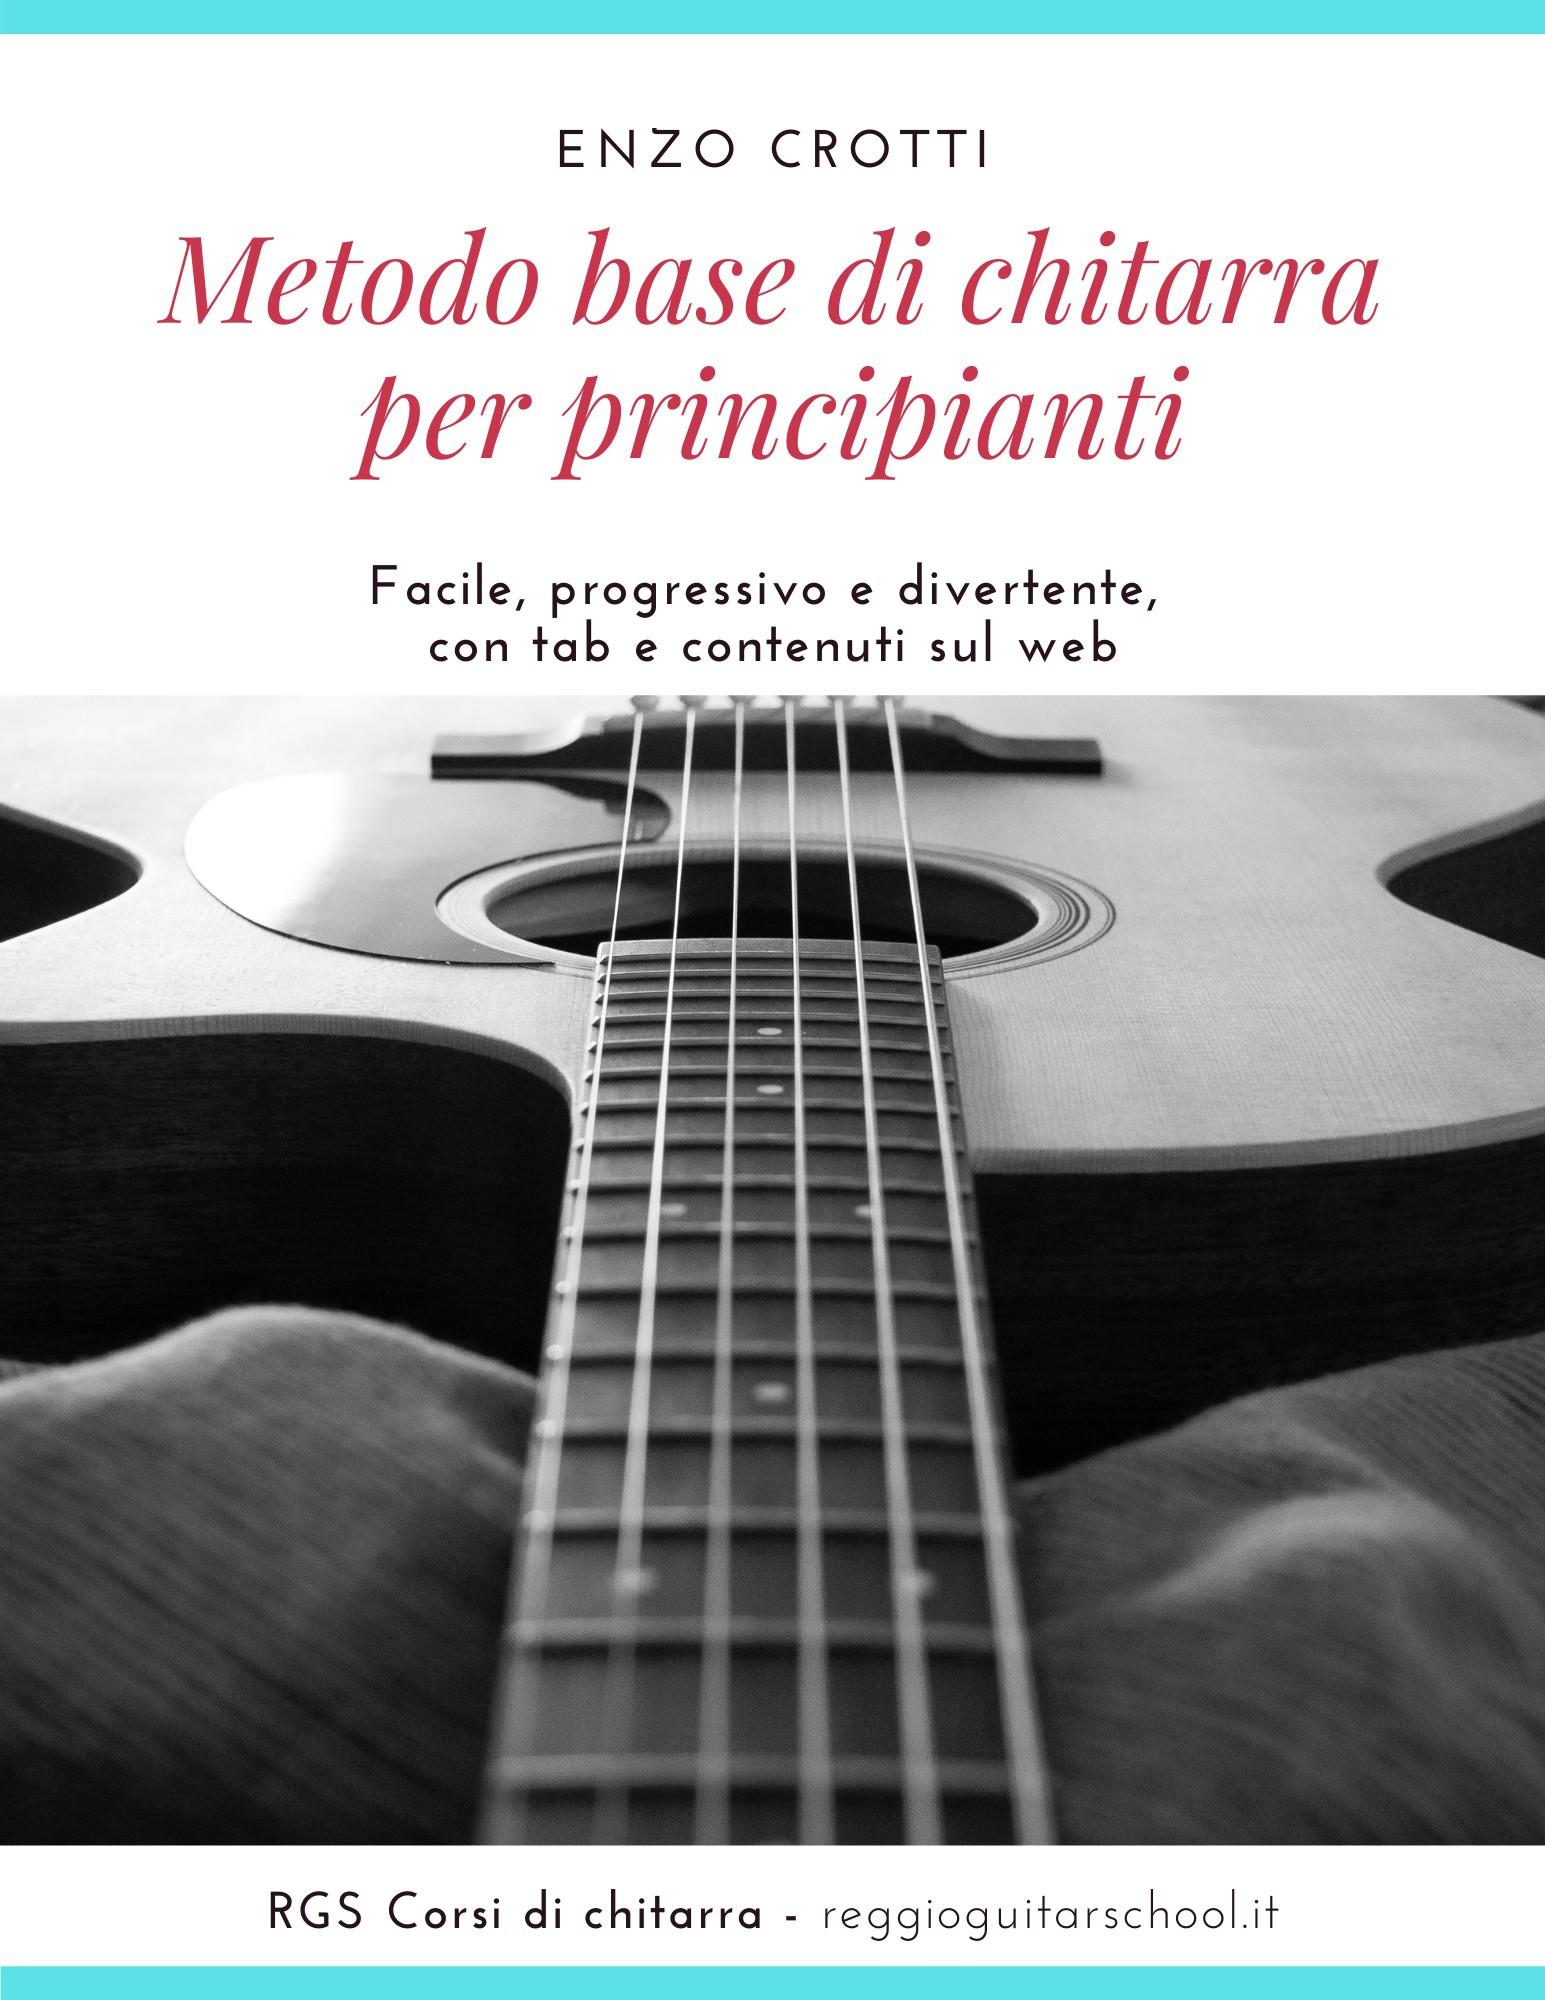 cover metodo base di chitarra